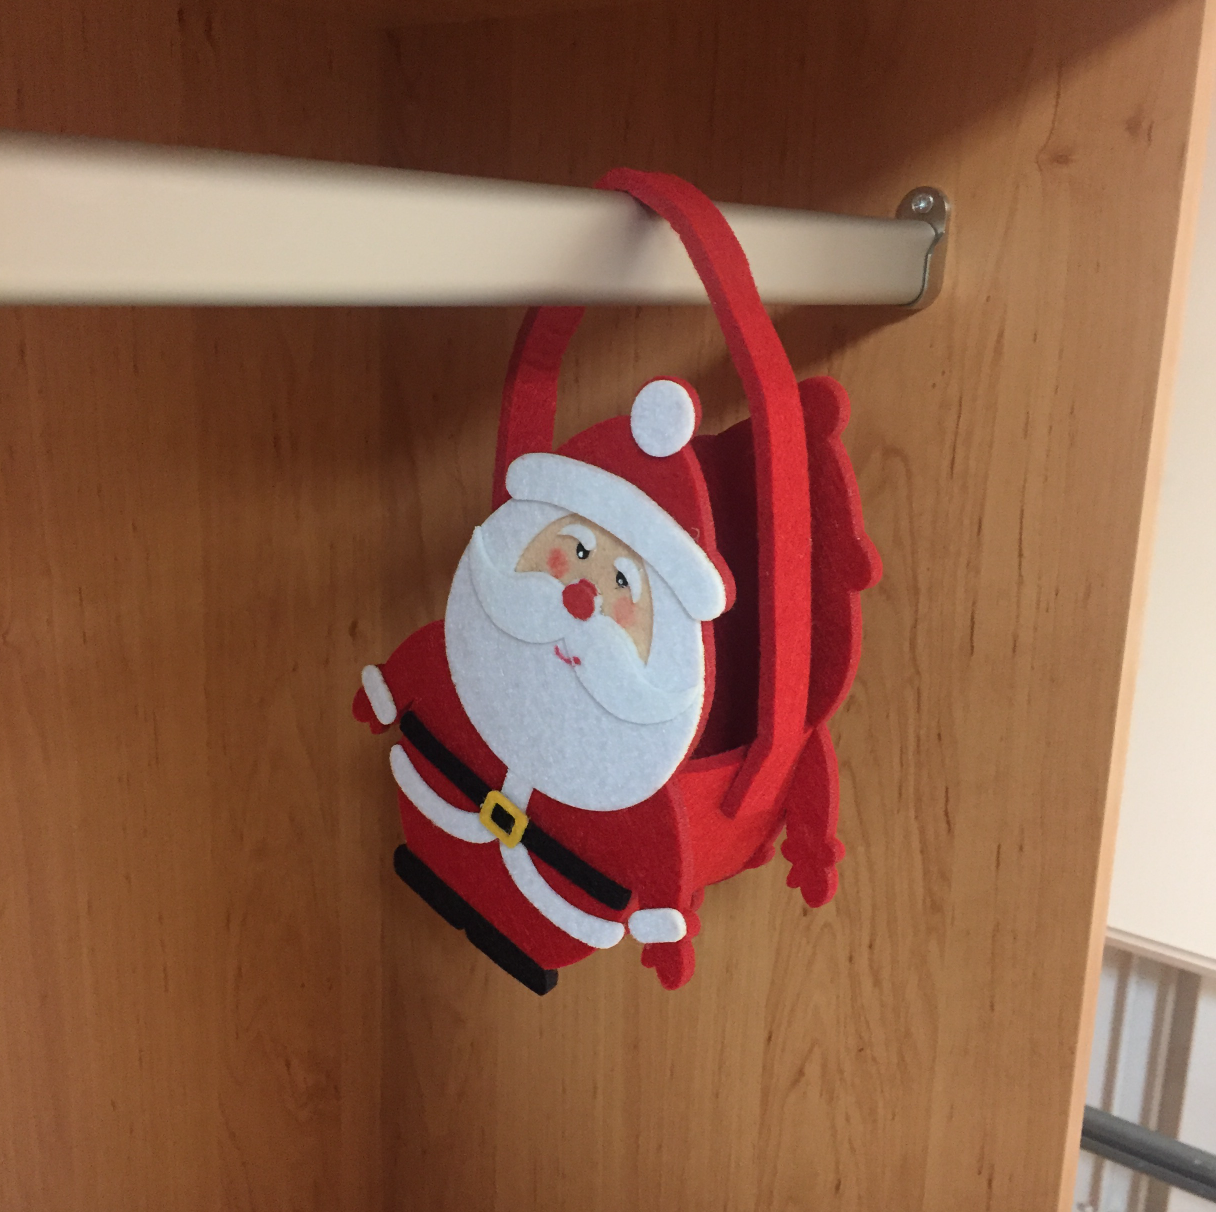 One of my teammates cute little santa bags!